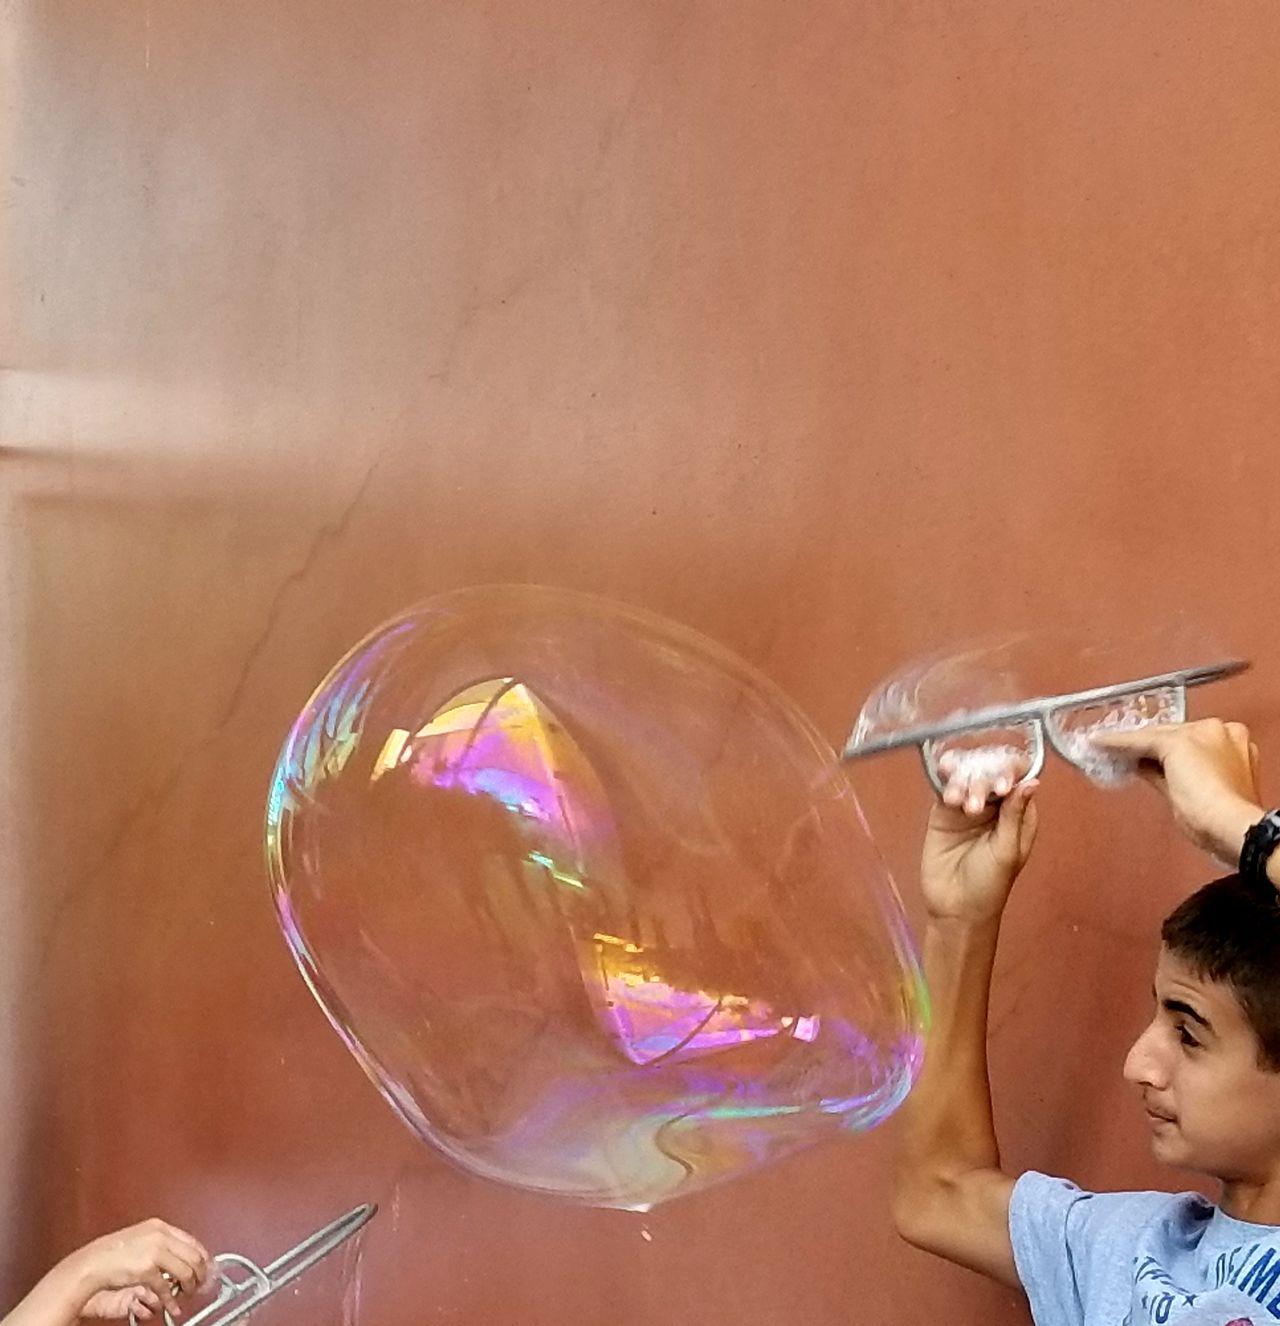 Playing With Soap Bubbles Bubble Huge Bubble Playing Child Playing With Bubbles Childrens Museum Doseum San Antonio, Texas Expressions EyeEm Best Shots EyeEm Selects EyeEmBestPics The Week On EyeEm